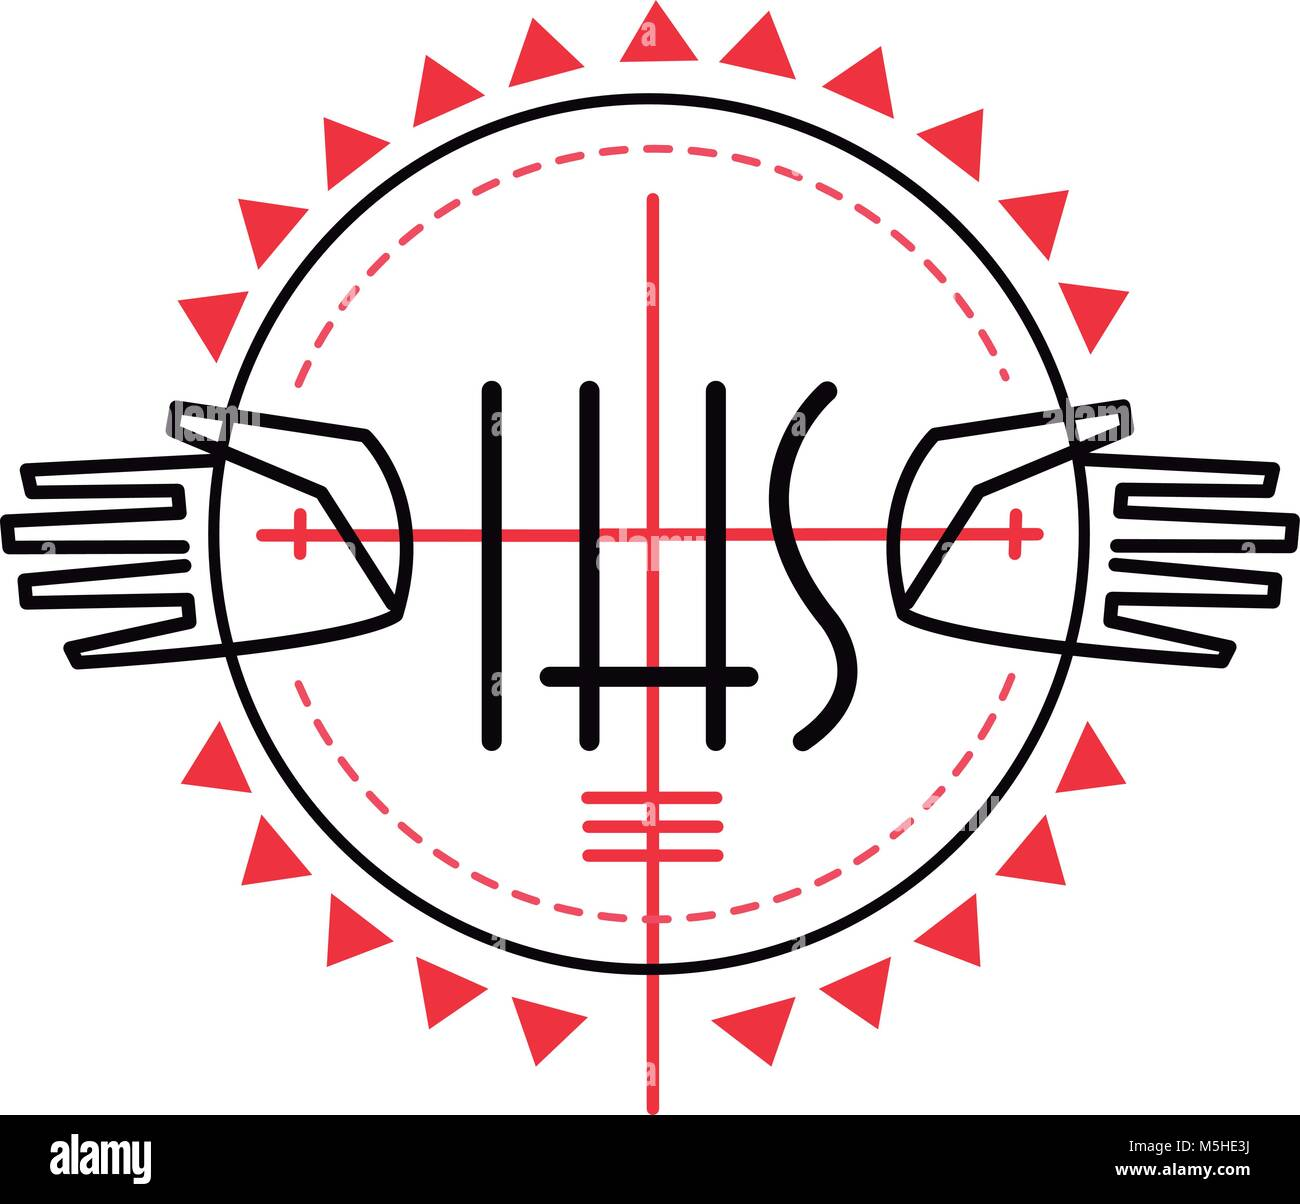 Monogram of jesus christ stock photos monogram of jesus christ hand drawn vector illustration or drawing of some religious christian symbols and jesus hands stock biocorpaavc